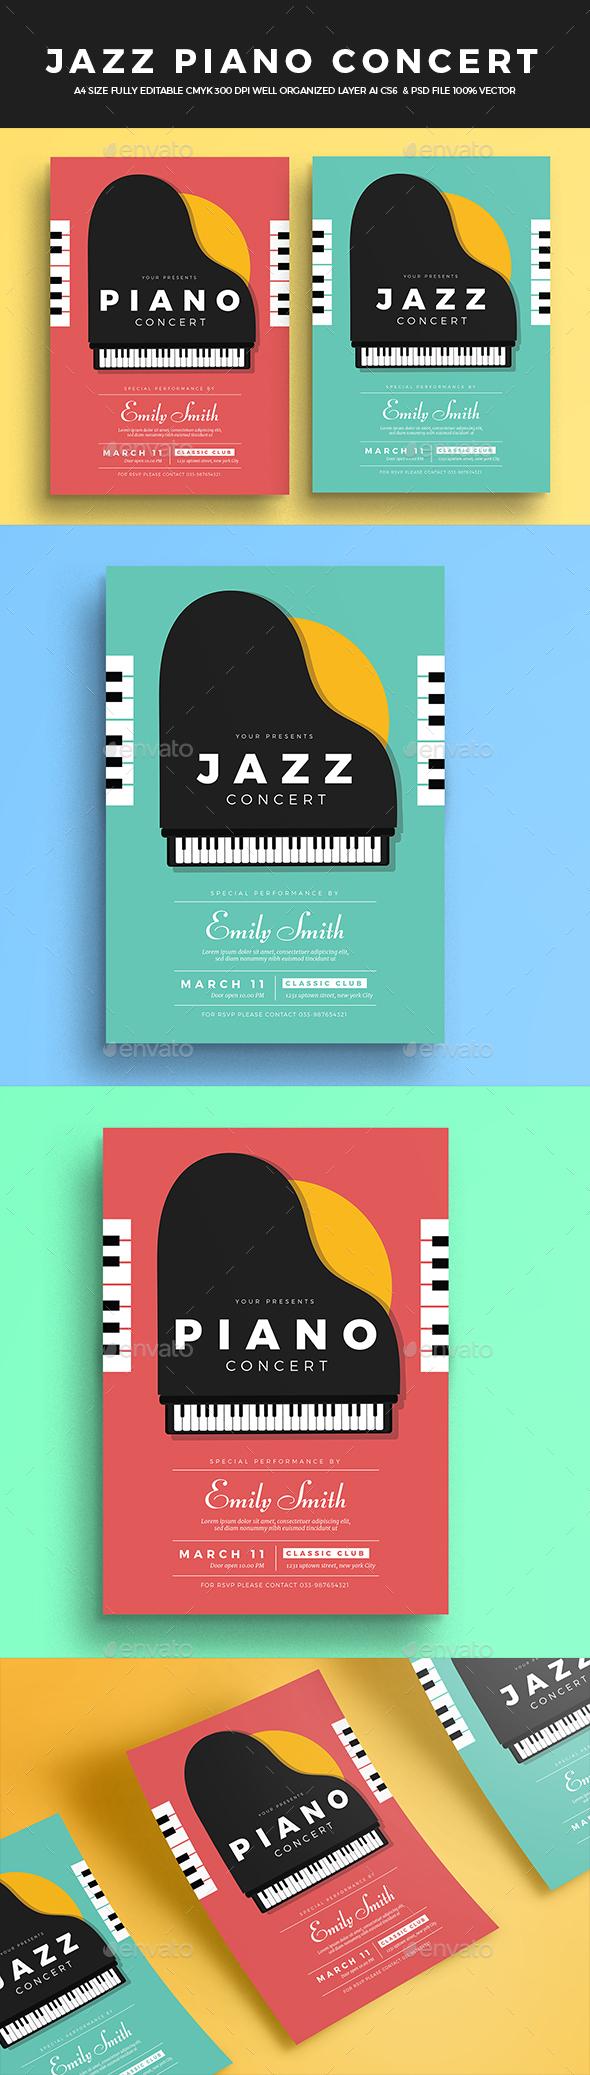 Jazz Piano Concert Flyer - Concerts Events